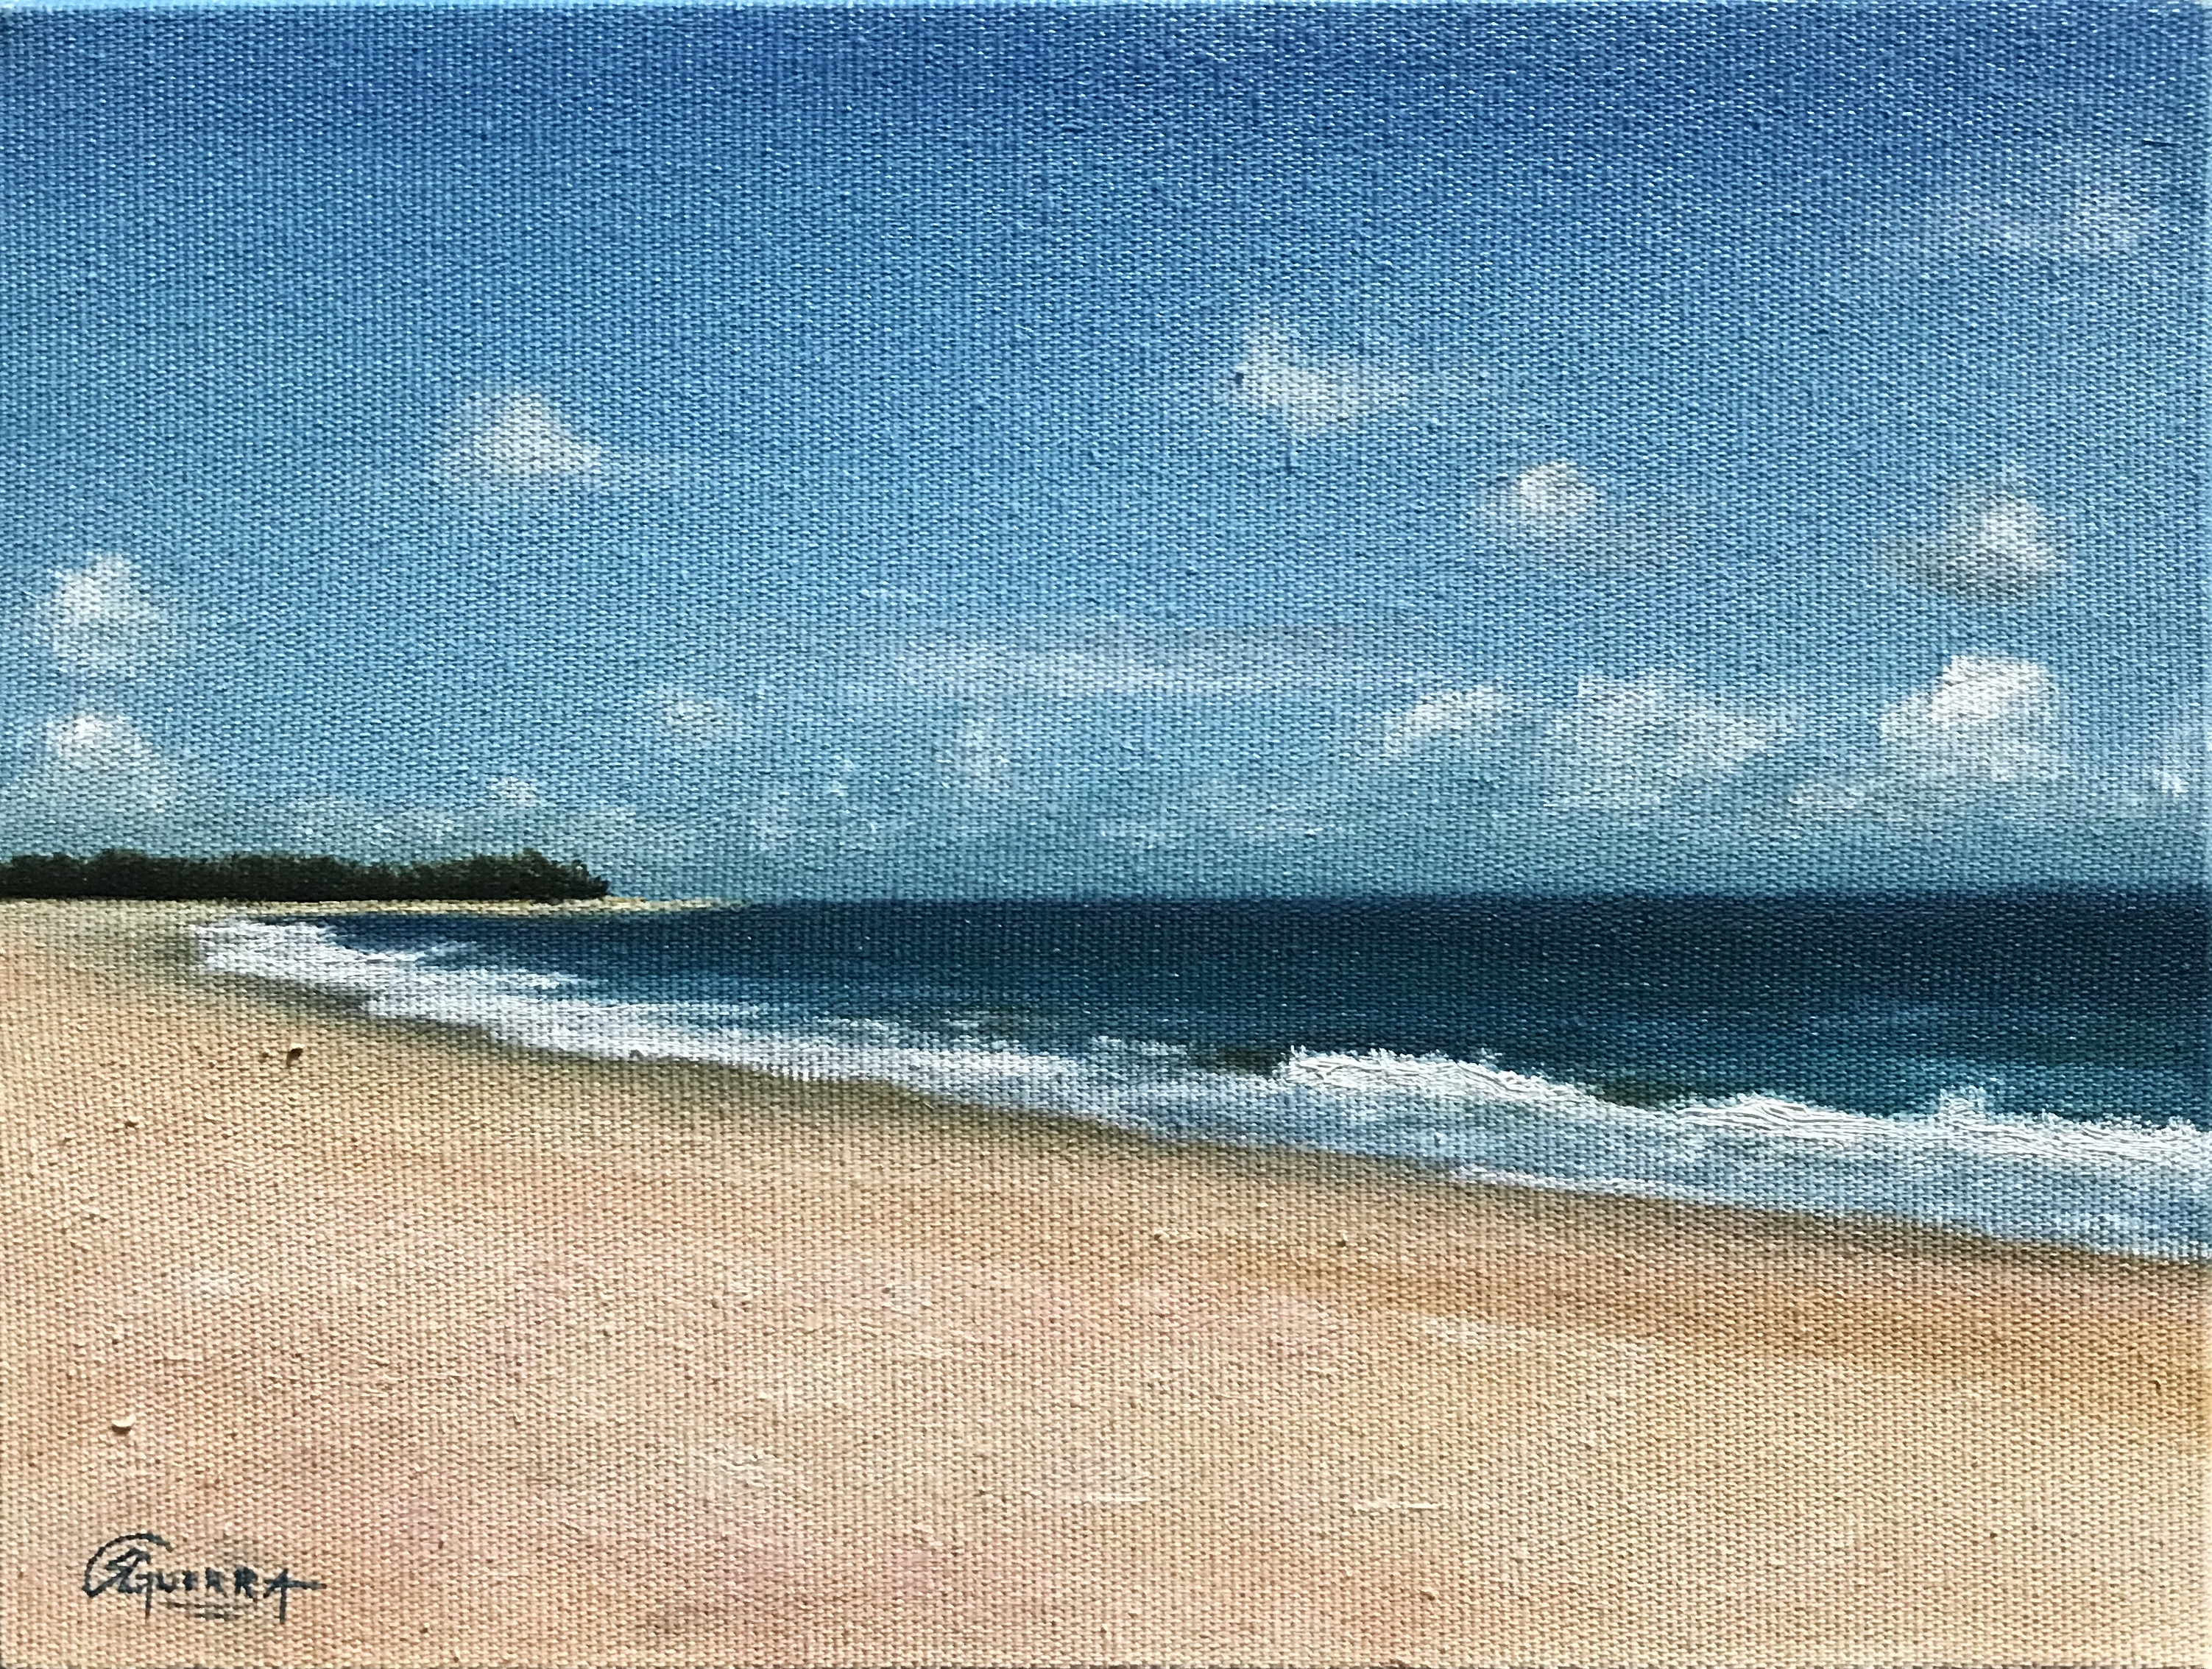 Paisagem de Praia Rafael Guerra